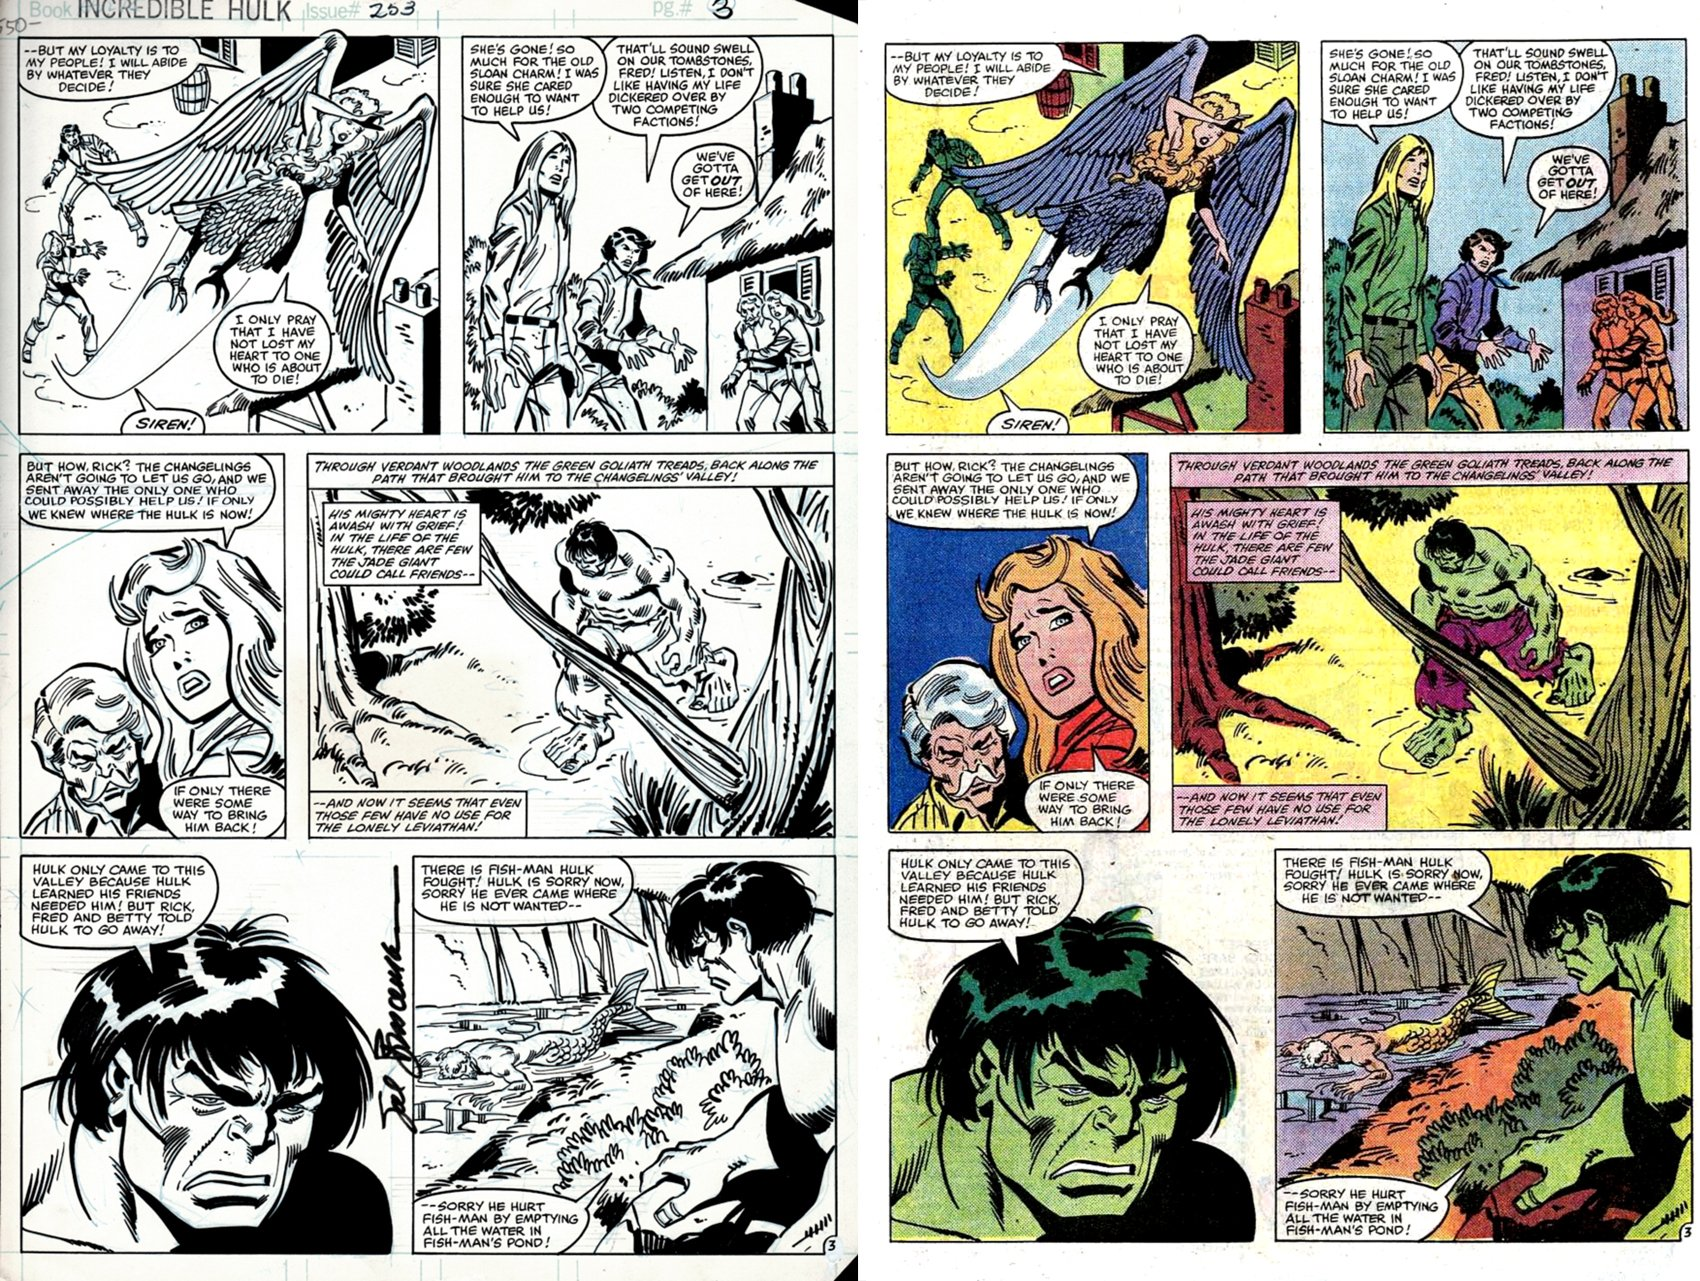 Incredible Hulk #253 p 3 (HULK, THE CHANGELINGS, RICK JONES!) 1980